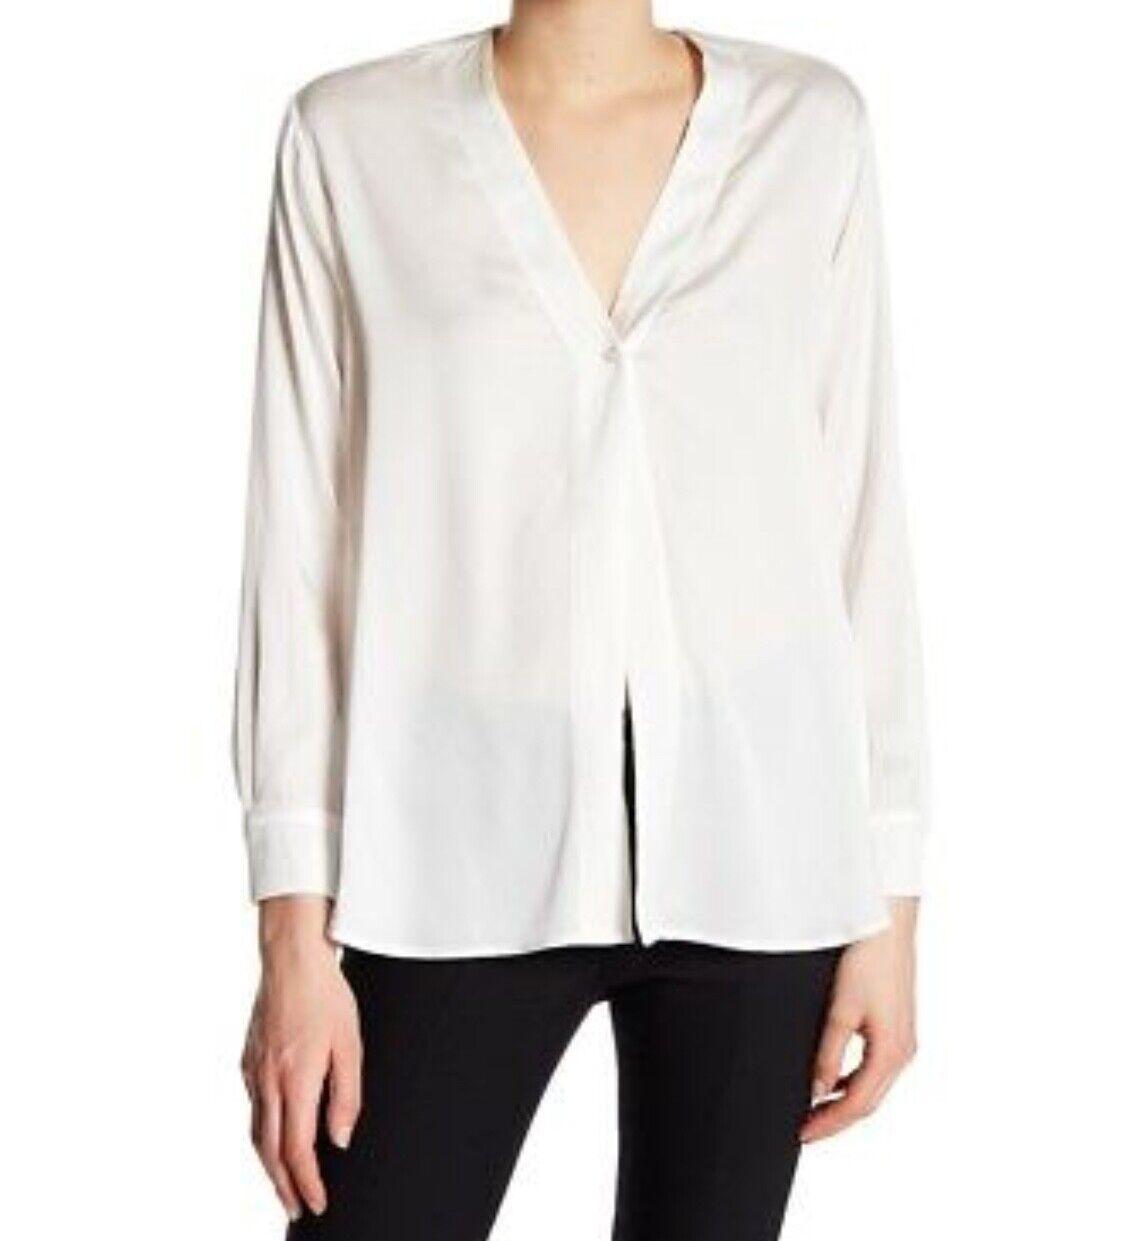 Vince  Satin Silk Blend Blouse Weiß Größe M Medium VX57211719